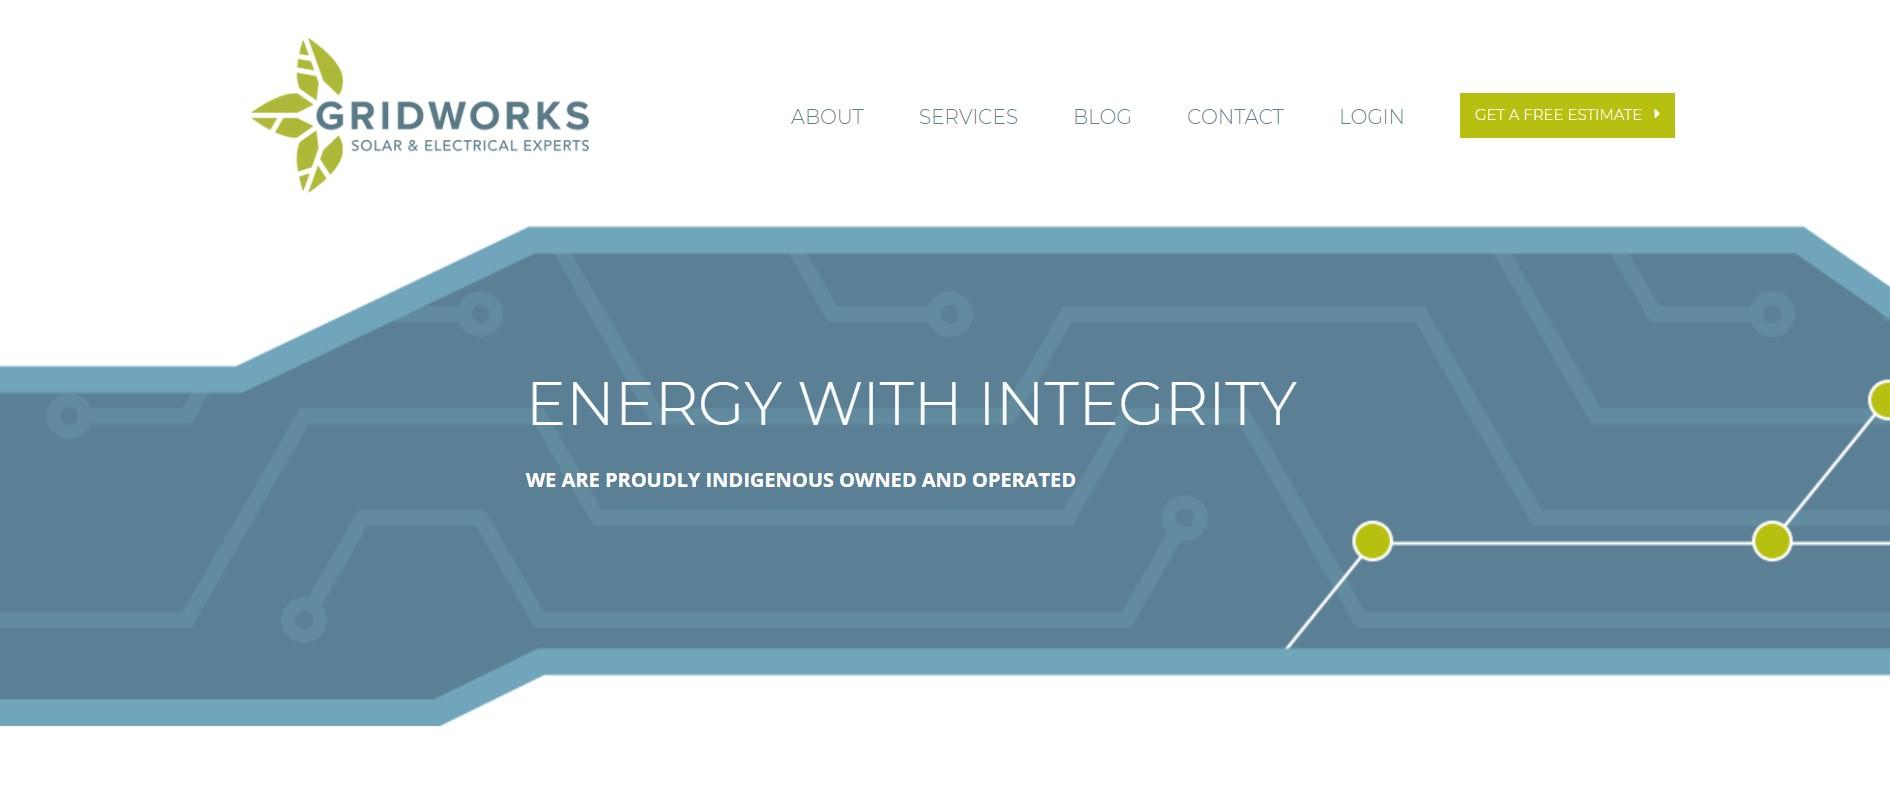 gridworks solar energy contractor in edmonton